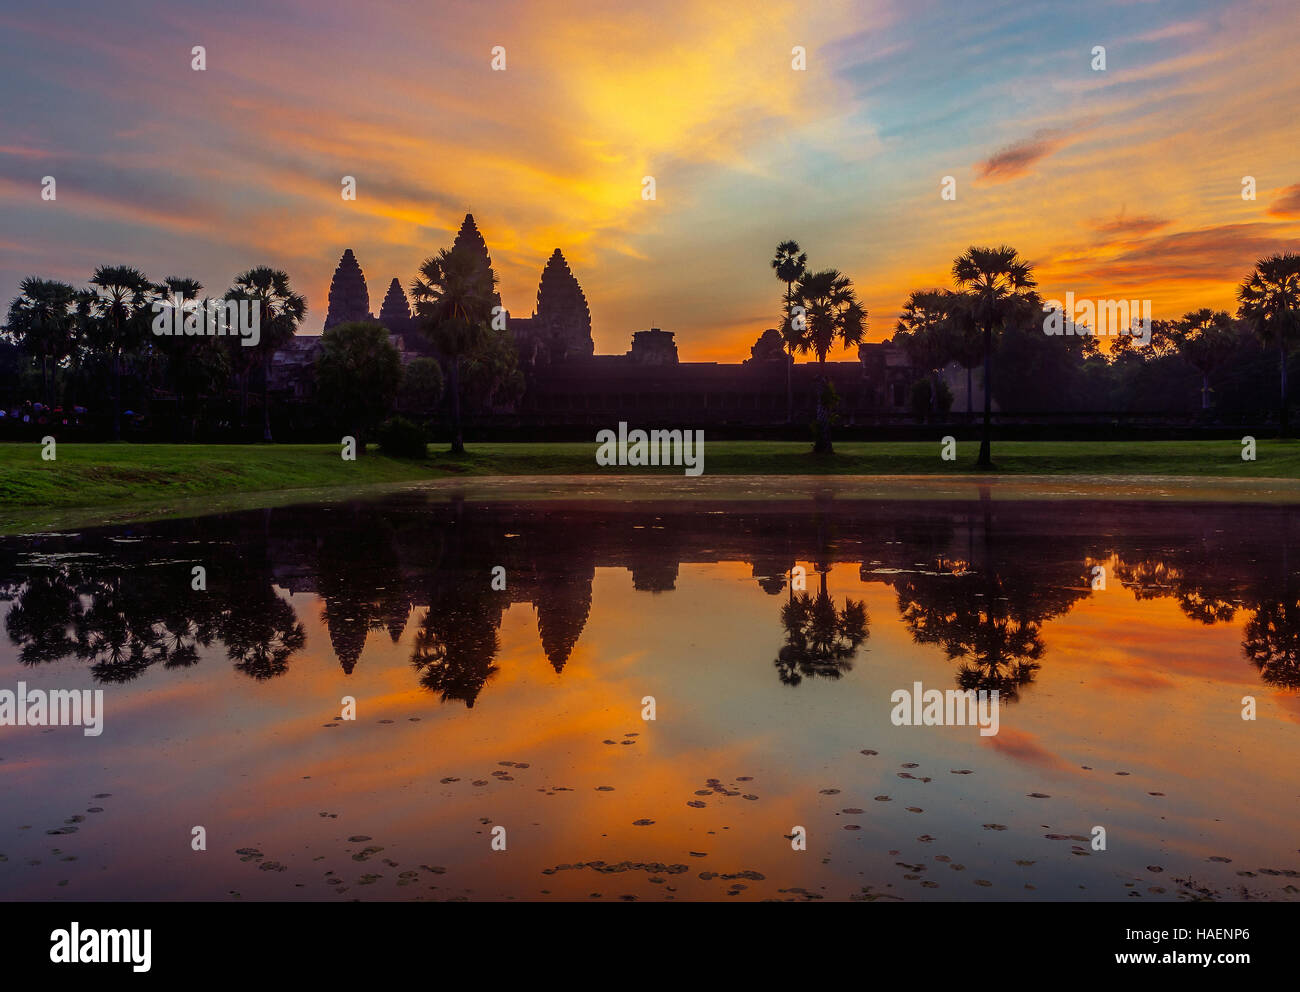 Lever du soleil sur Angkor Wat, Siem Reap, Royaume du Cambodge. Photo Stock